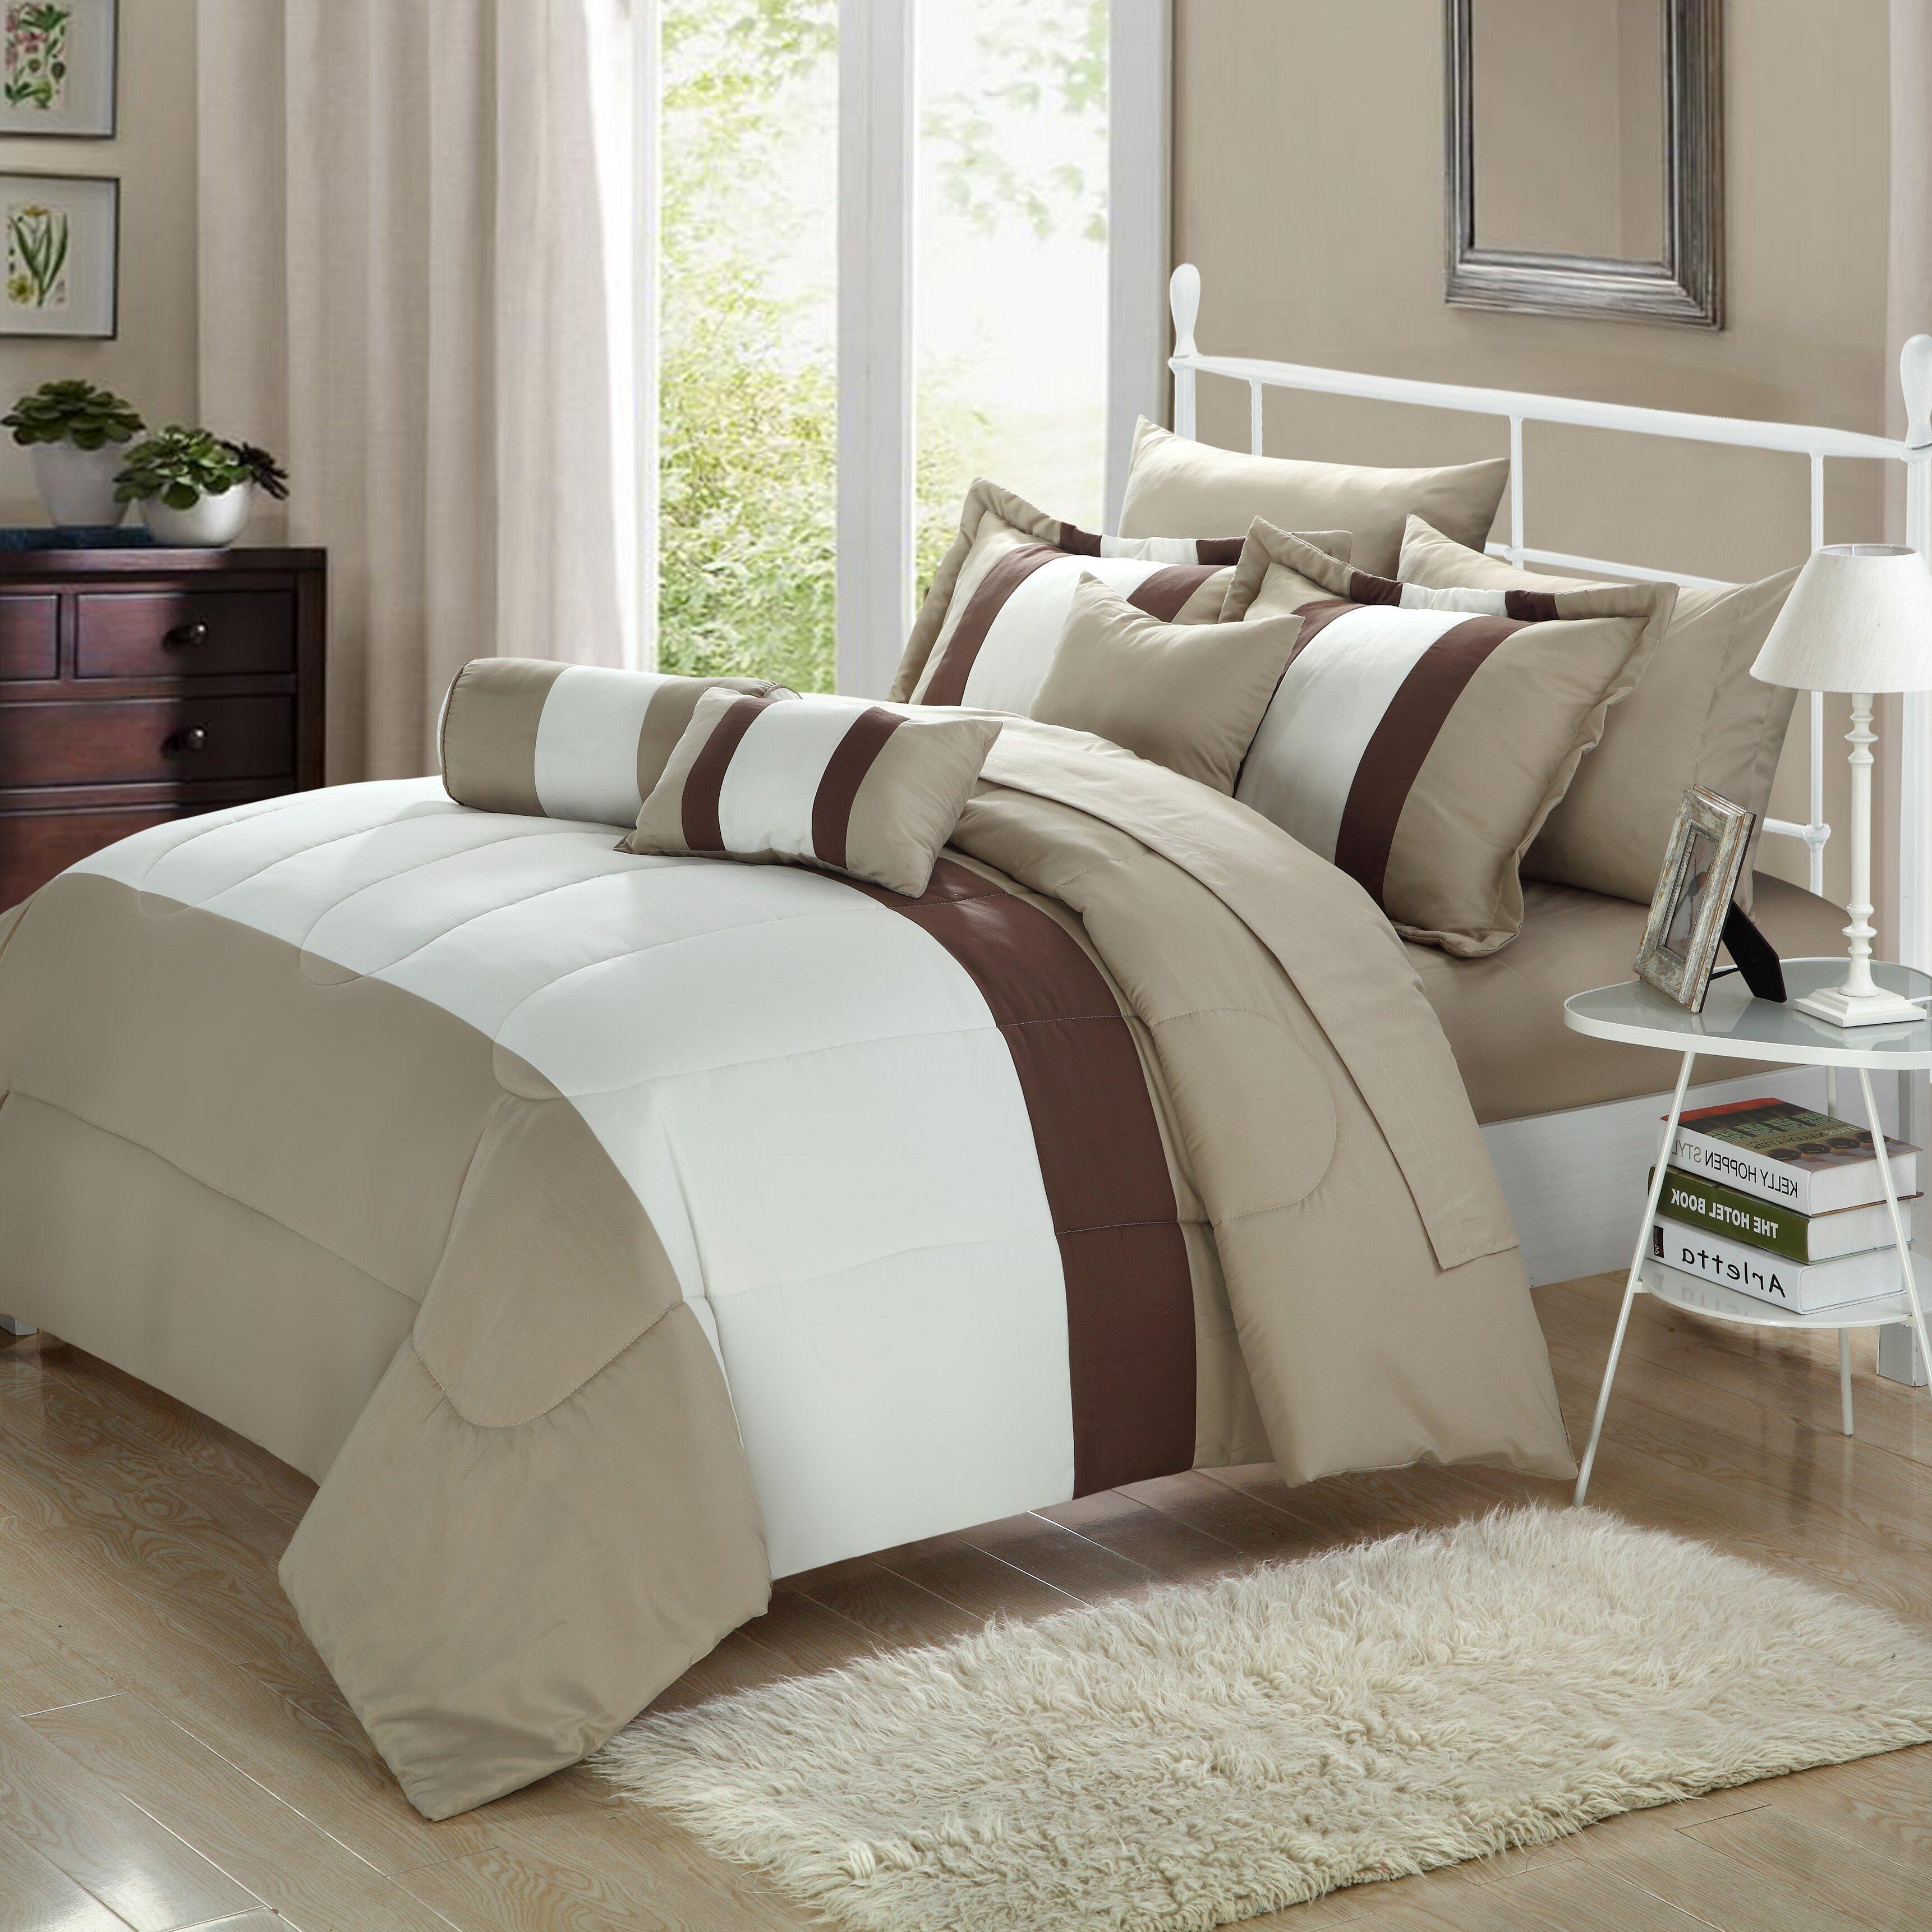 chic home serenity 10 piece comforter set & reviews | wayfair